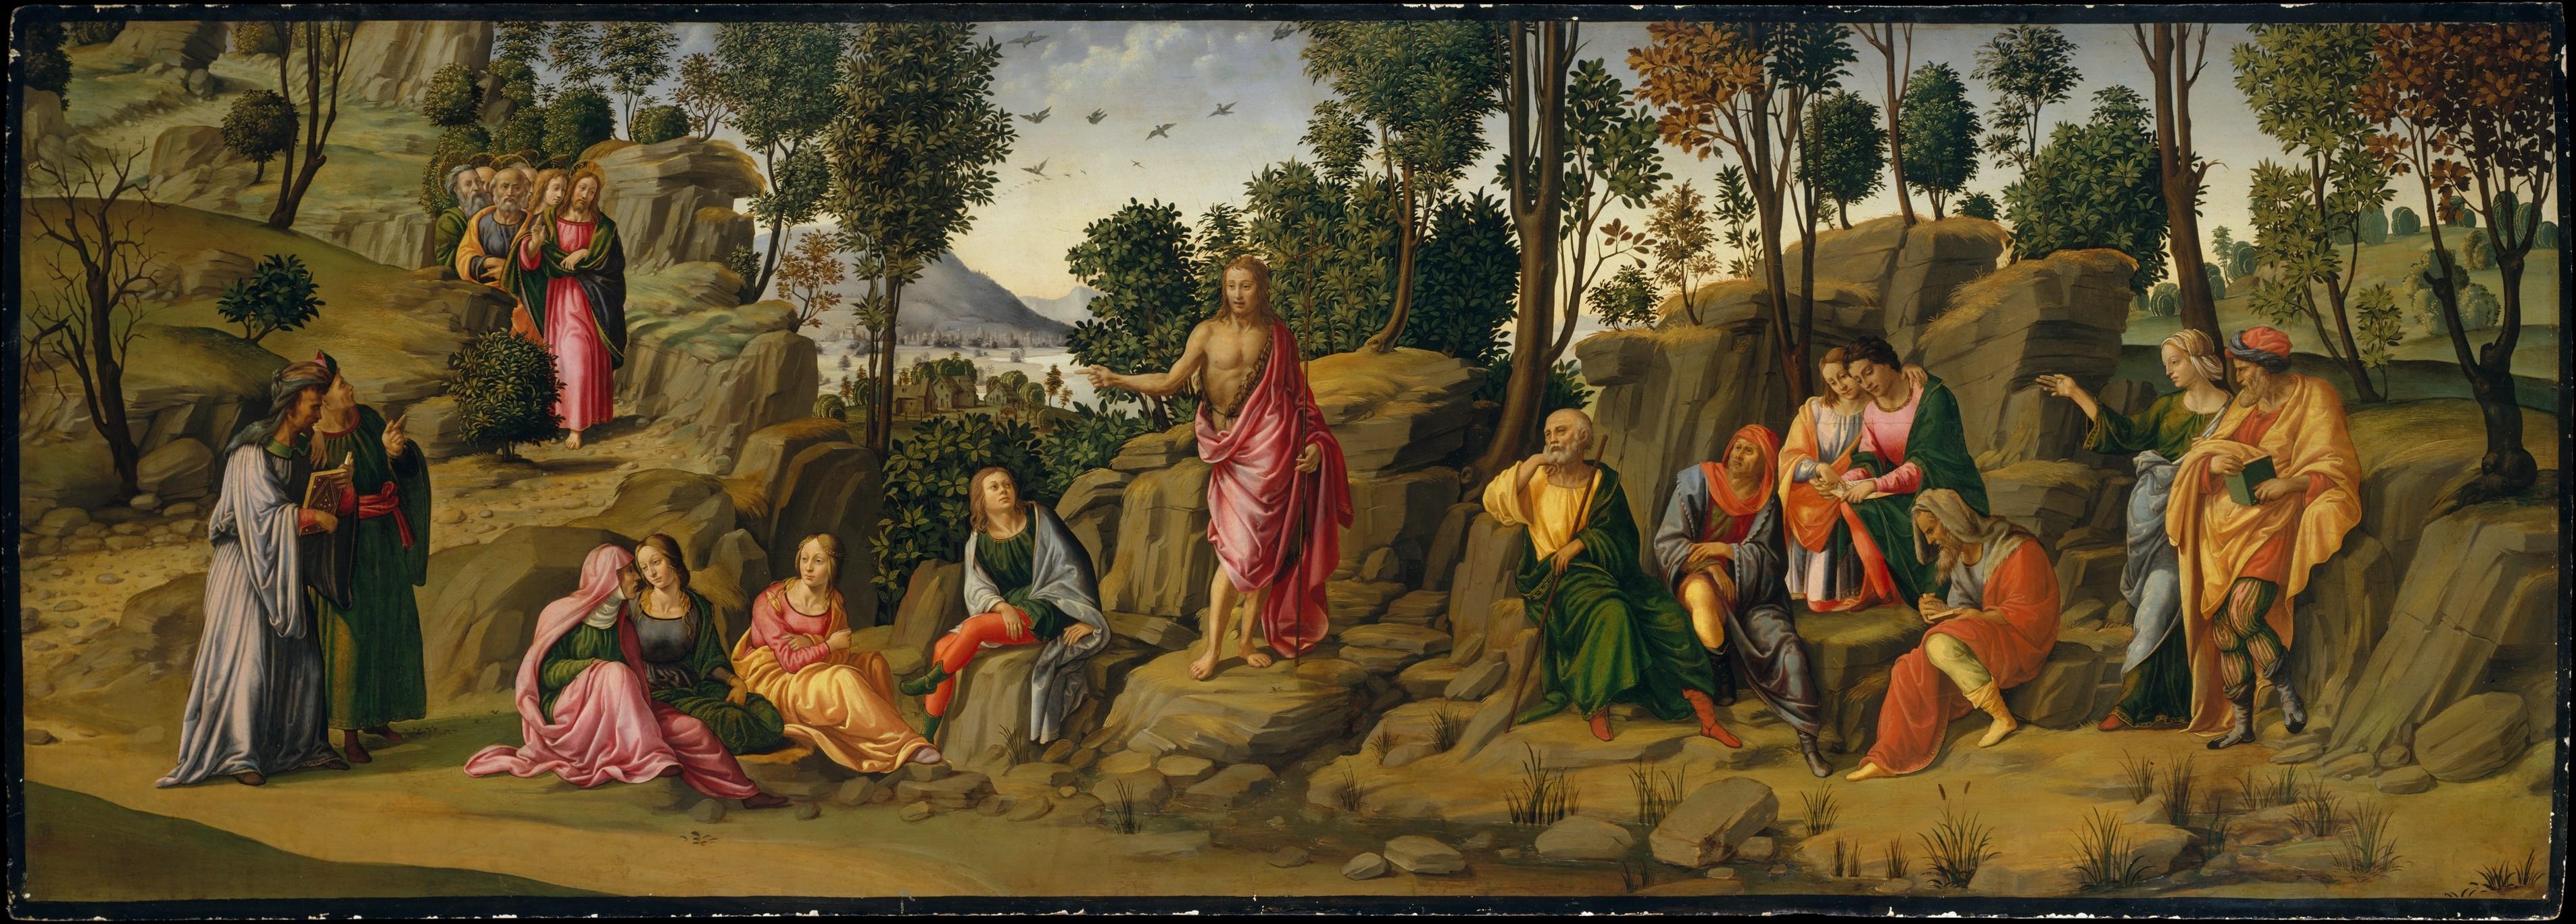 Saint John the Baptist Bearing Witness (painting)